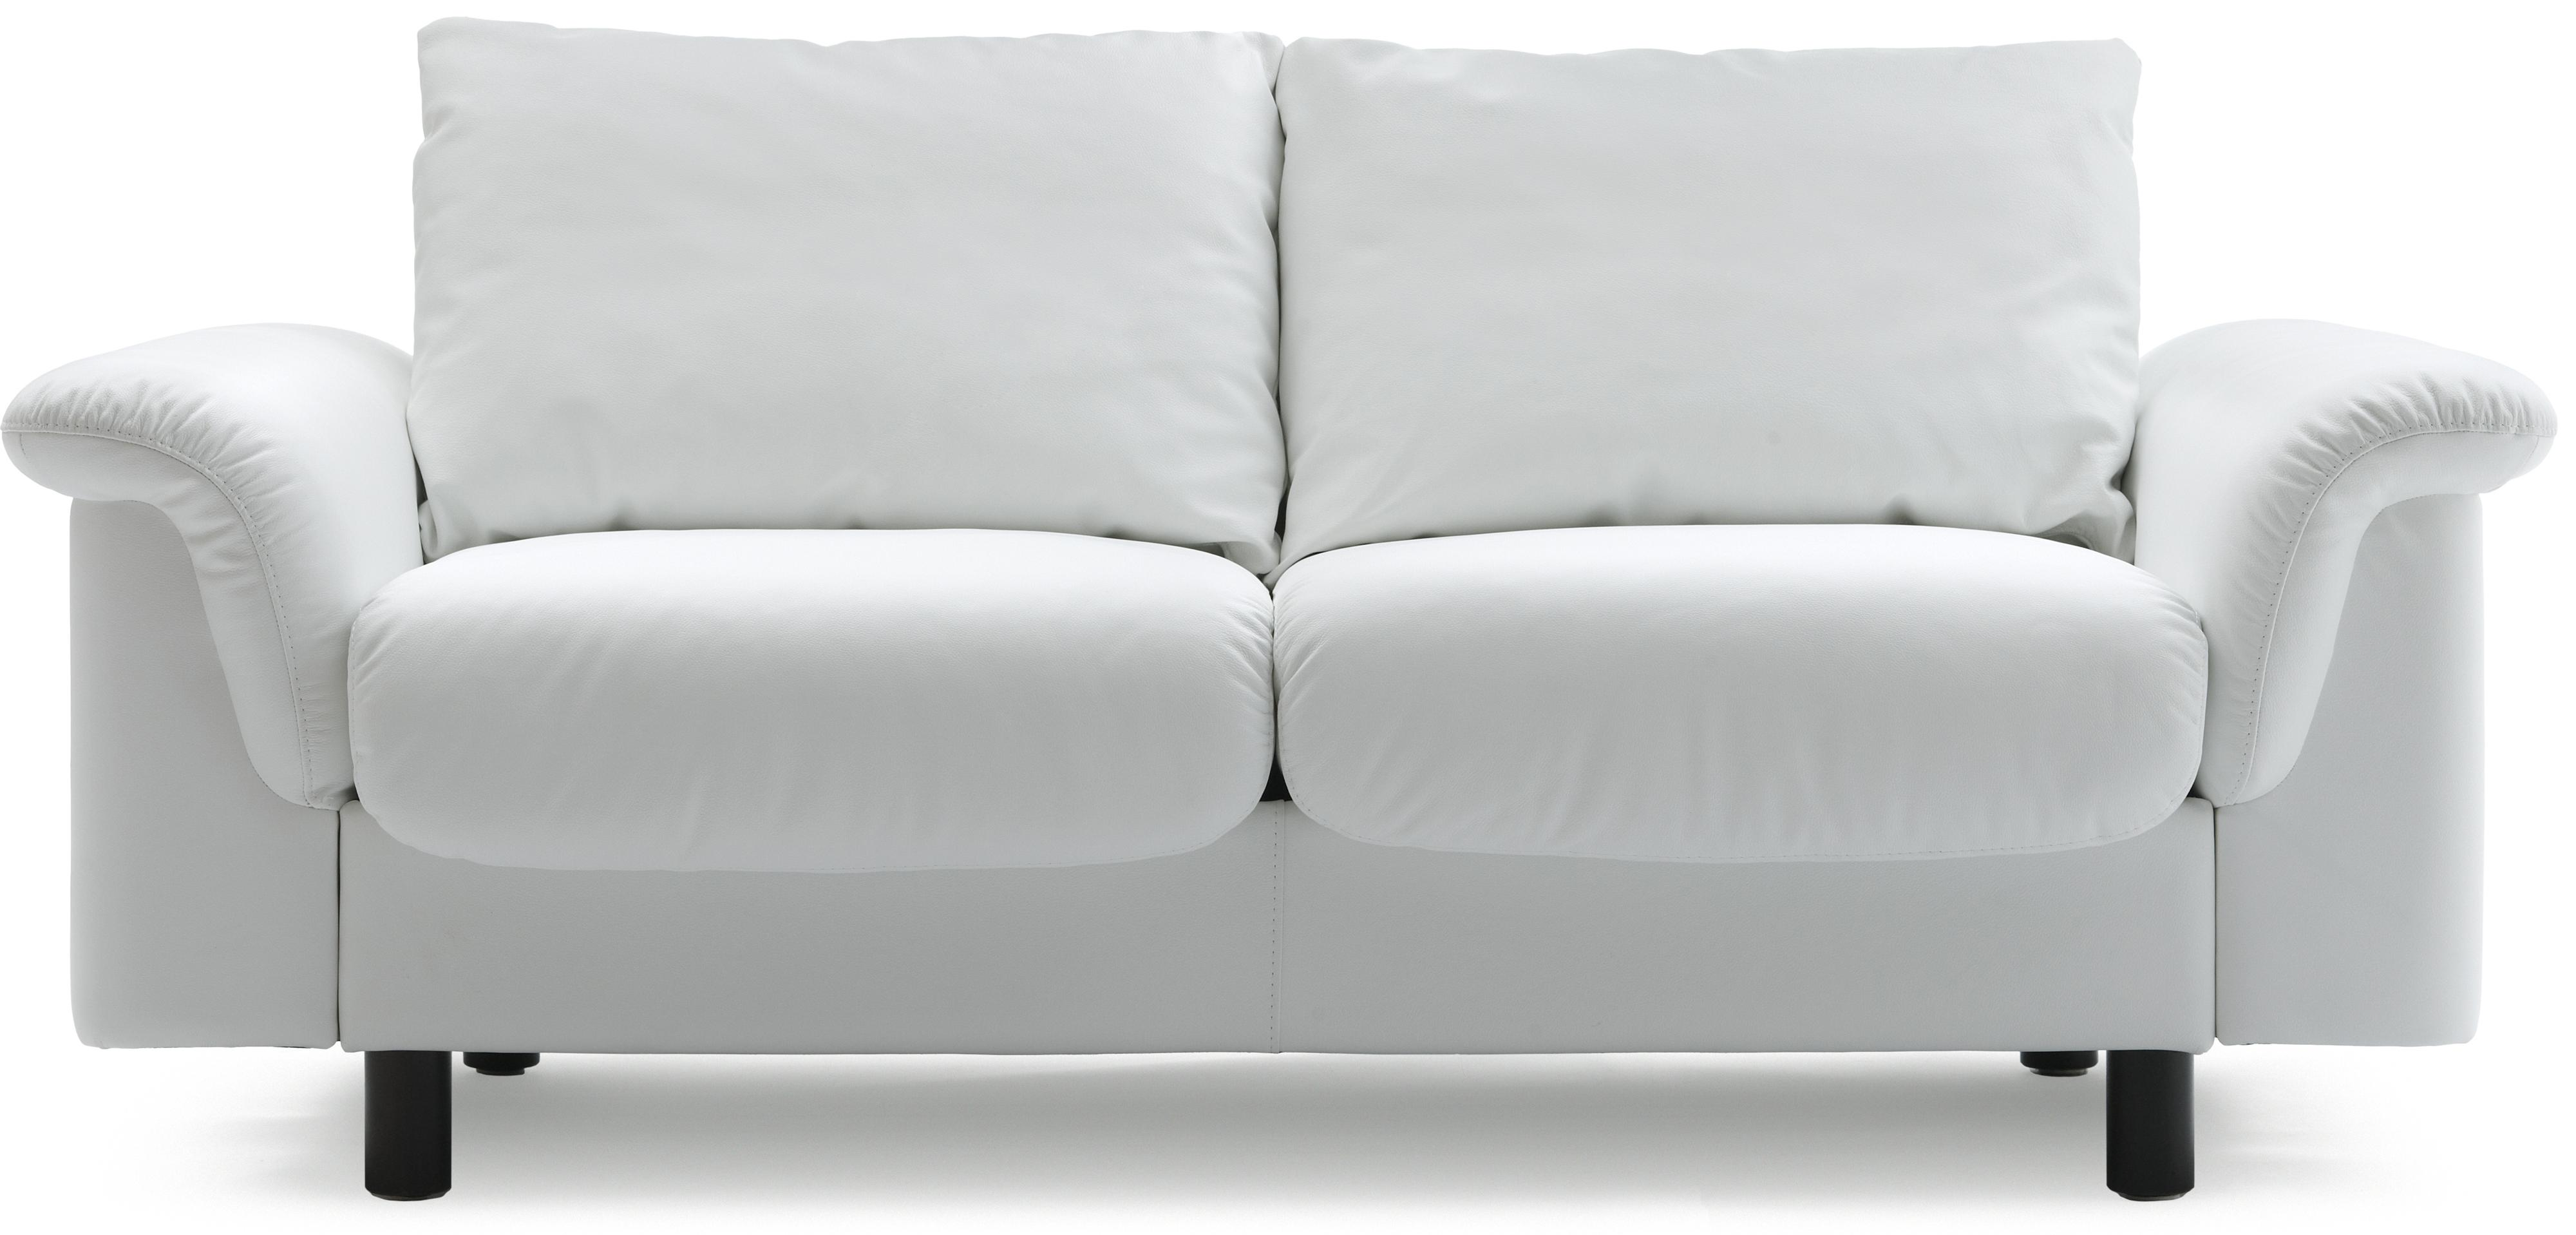 2 seater love chair design awards stressless e300 loveseat fashion furniture